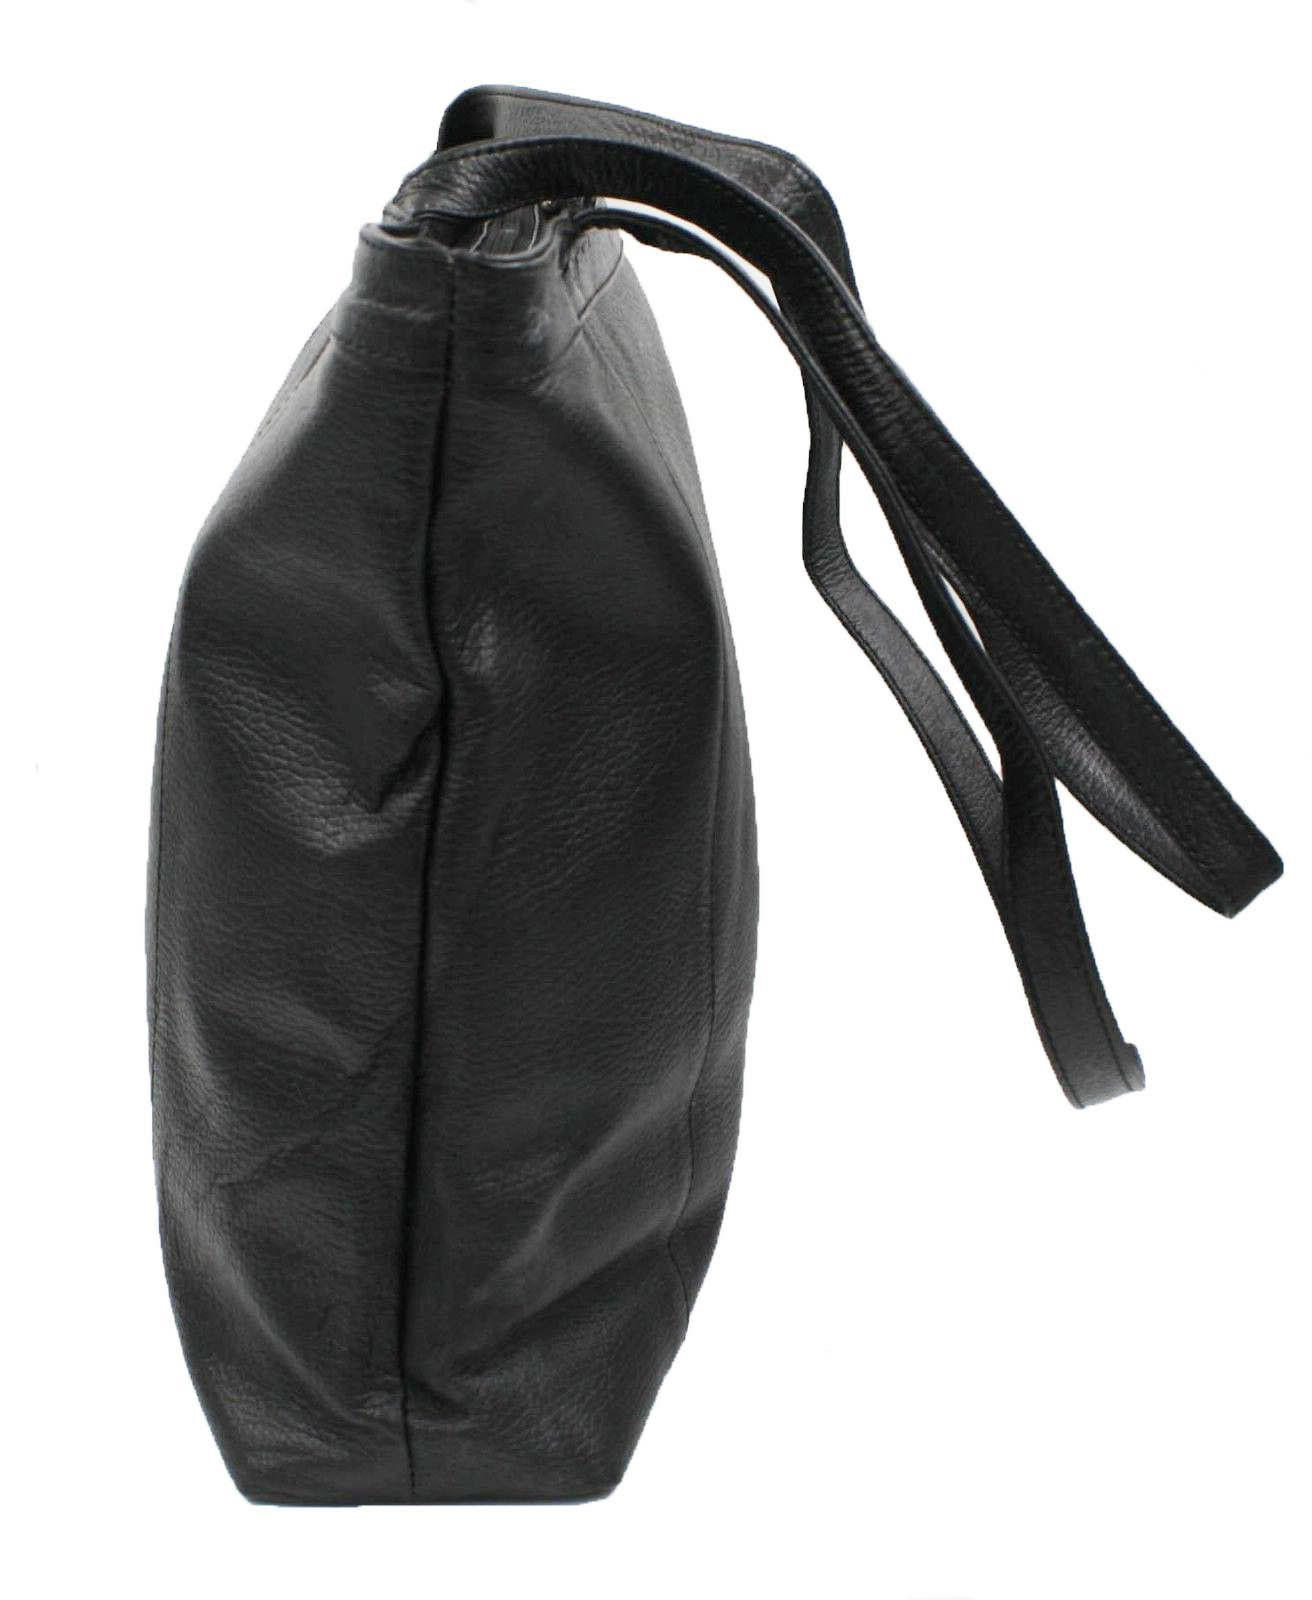 Genuine Leather Black Tote Large Handbag Purse